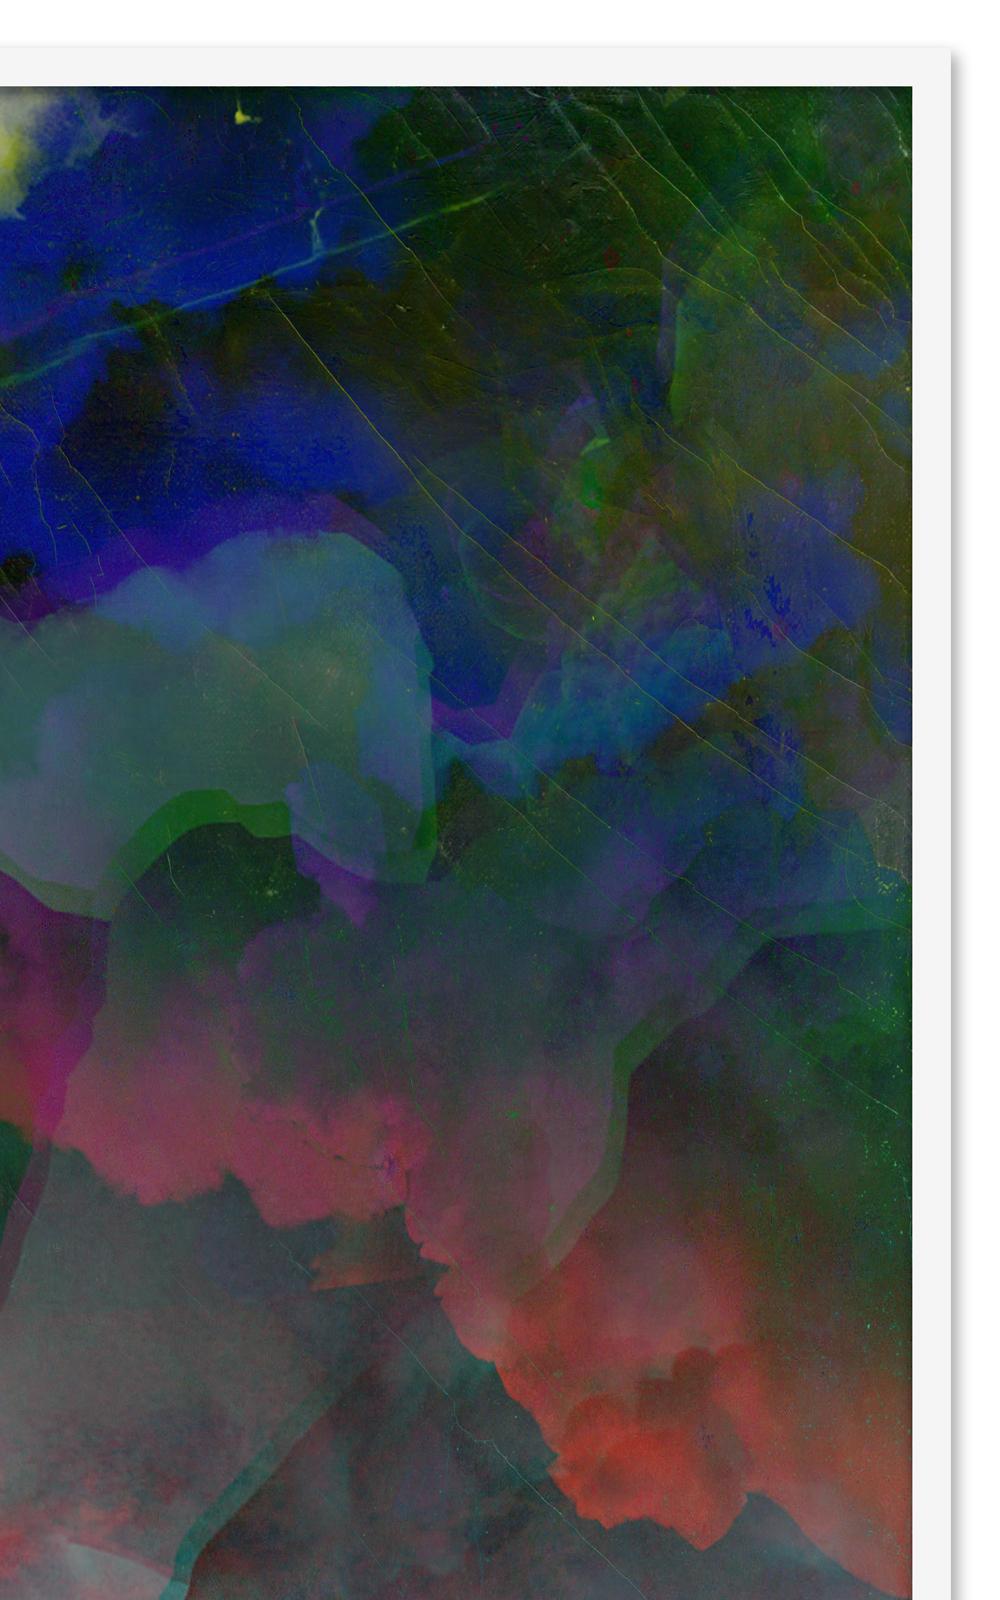 Case Simmons, Simmons & Burke, Composite C, Kohn Gallery,C-Print, Digital Collage,Digital Art, Photoshop Collage, Contemporary Collage,Case Simmons Art, Case Simmons Artist, Collage Fine Art, Digital Landscape